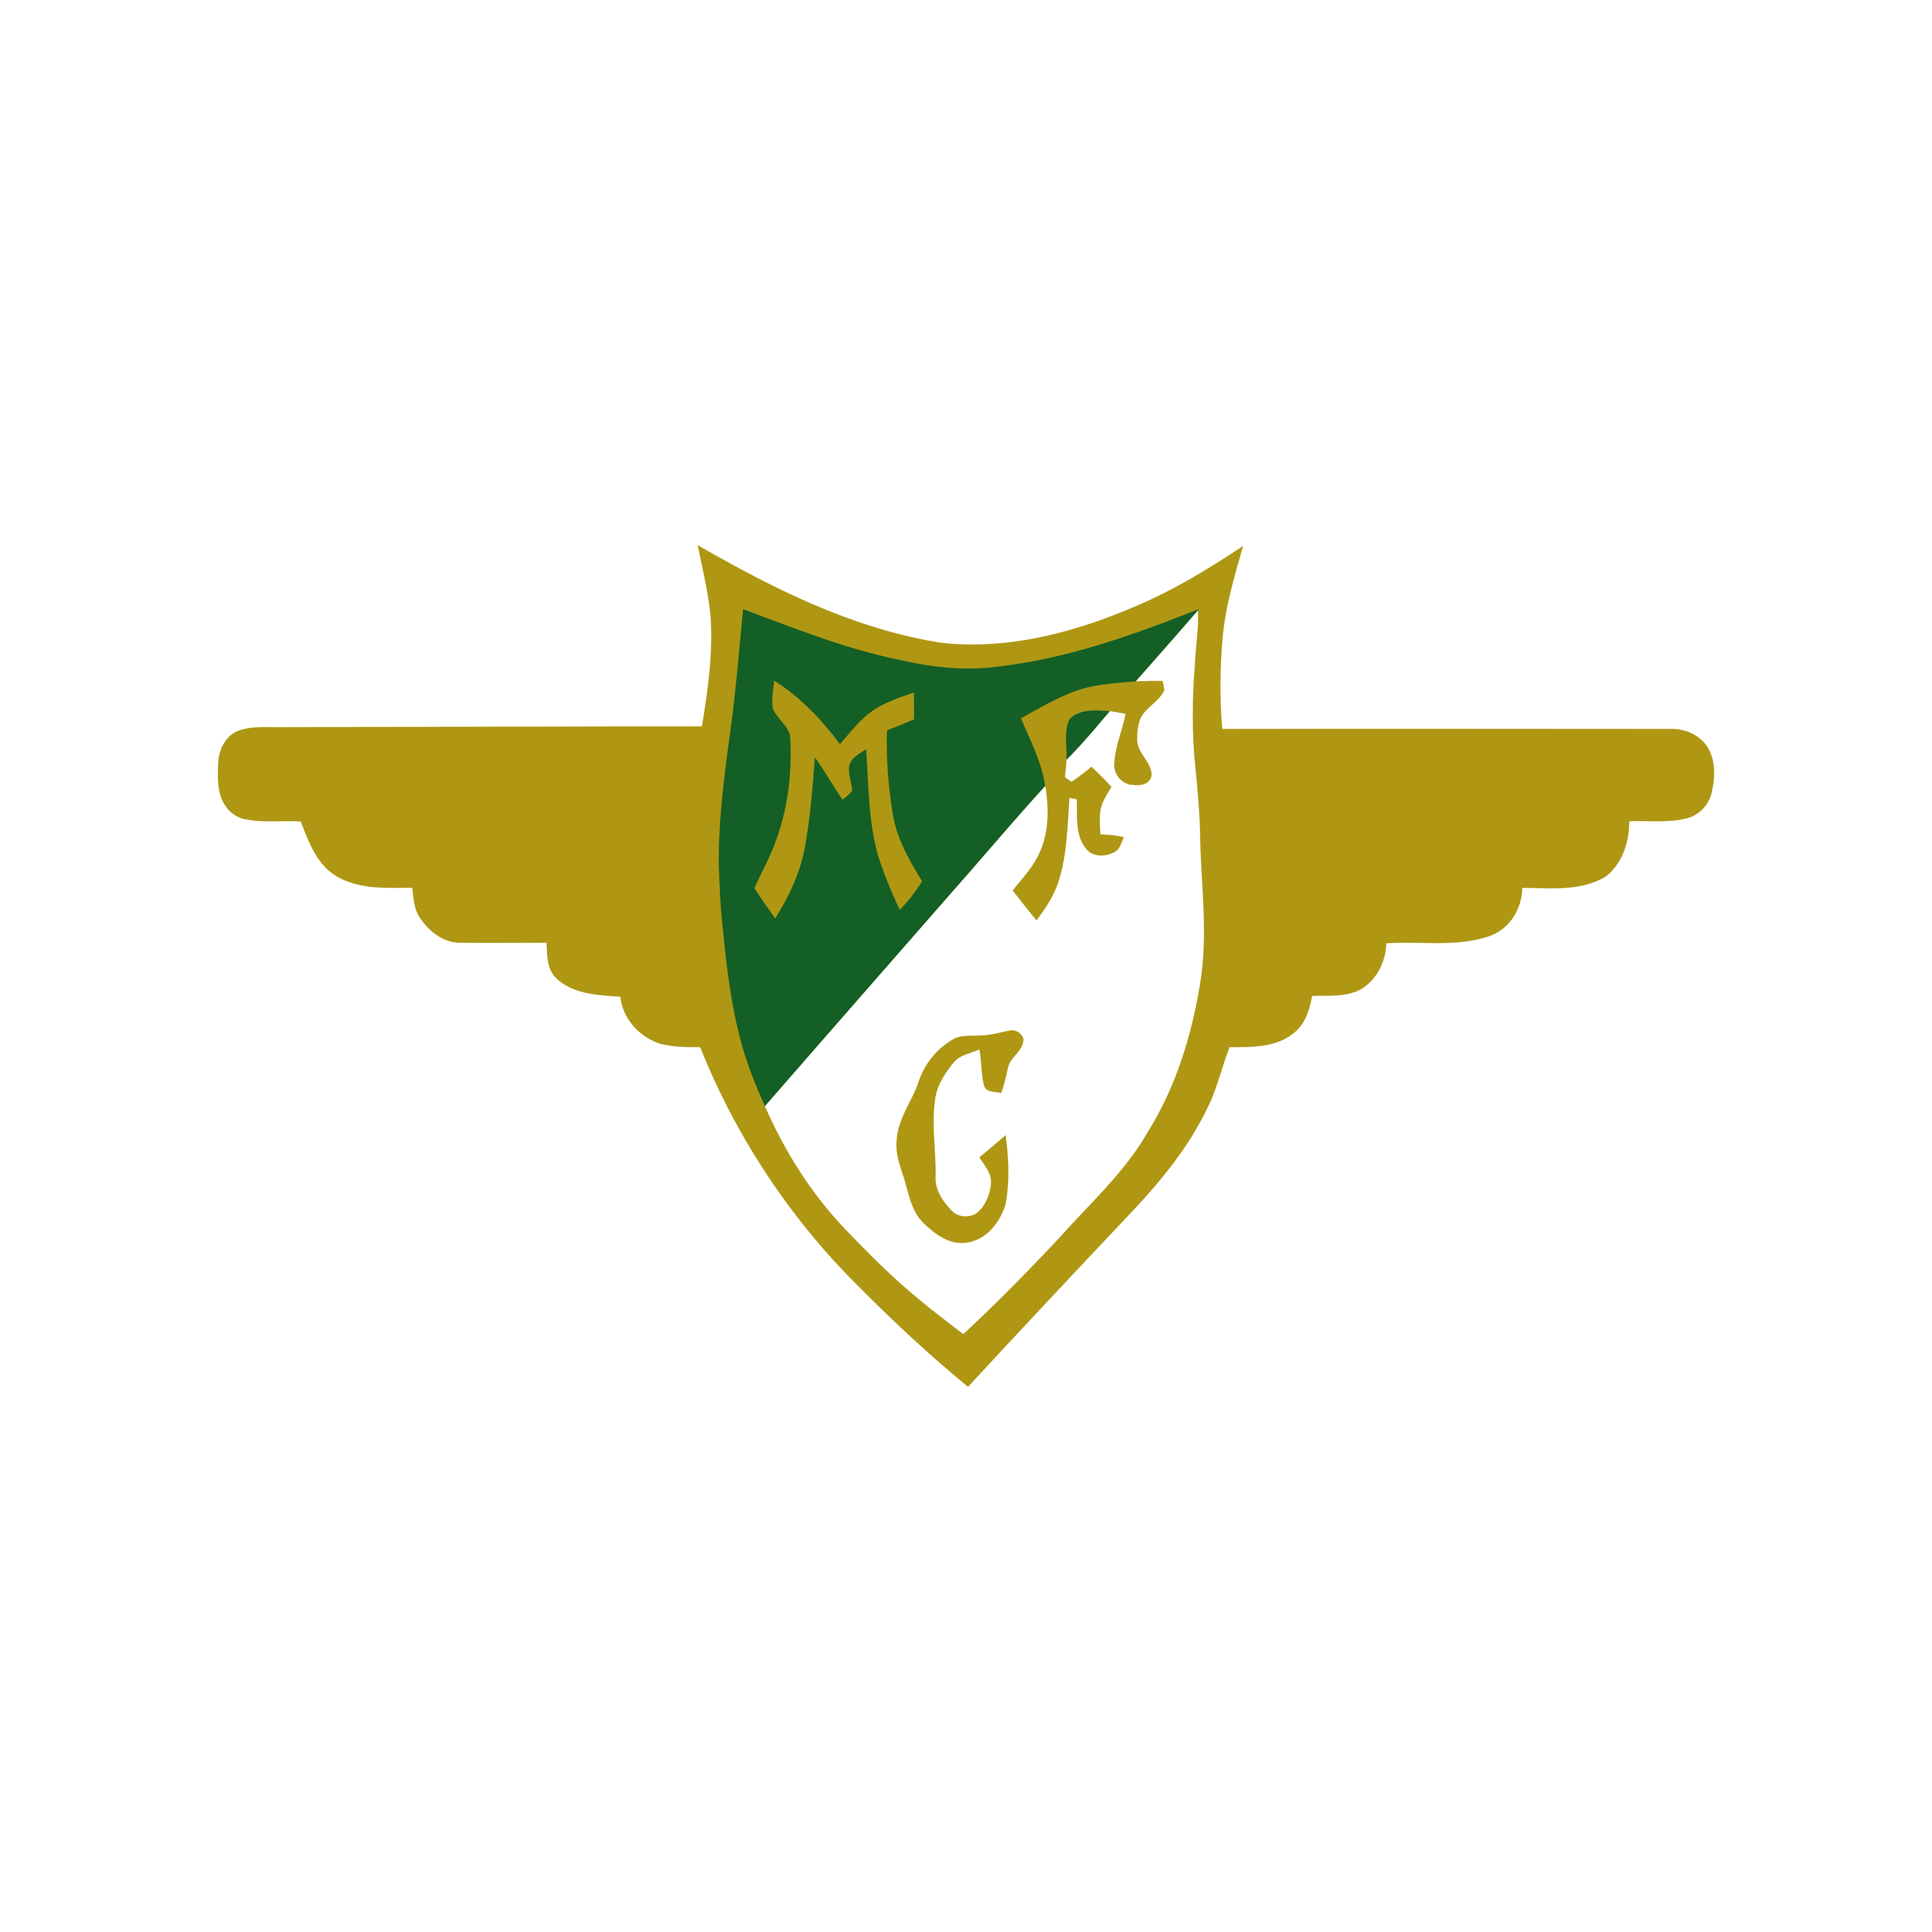 moreirense fc logo 0 - Moreirense FC Logo